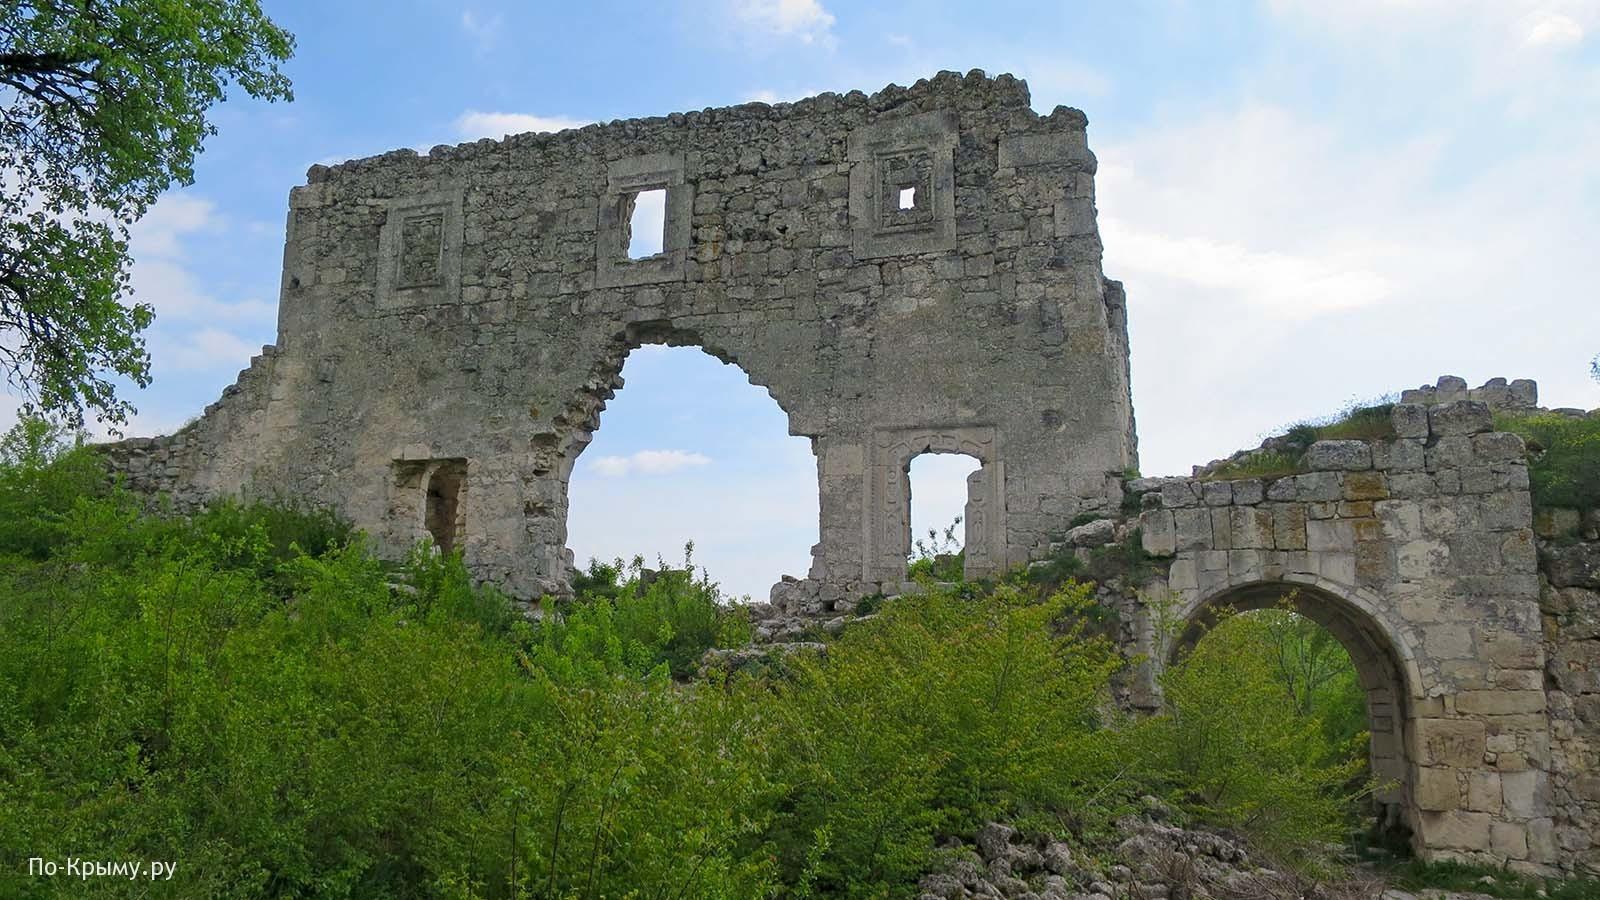 Башня у крепостных ворот Мангуп-Кале